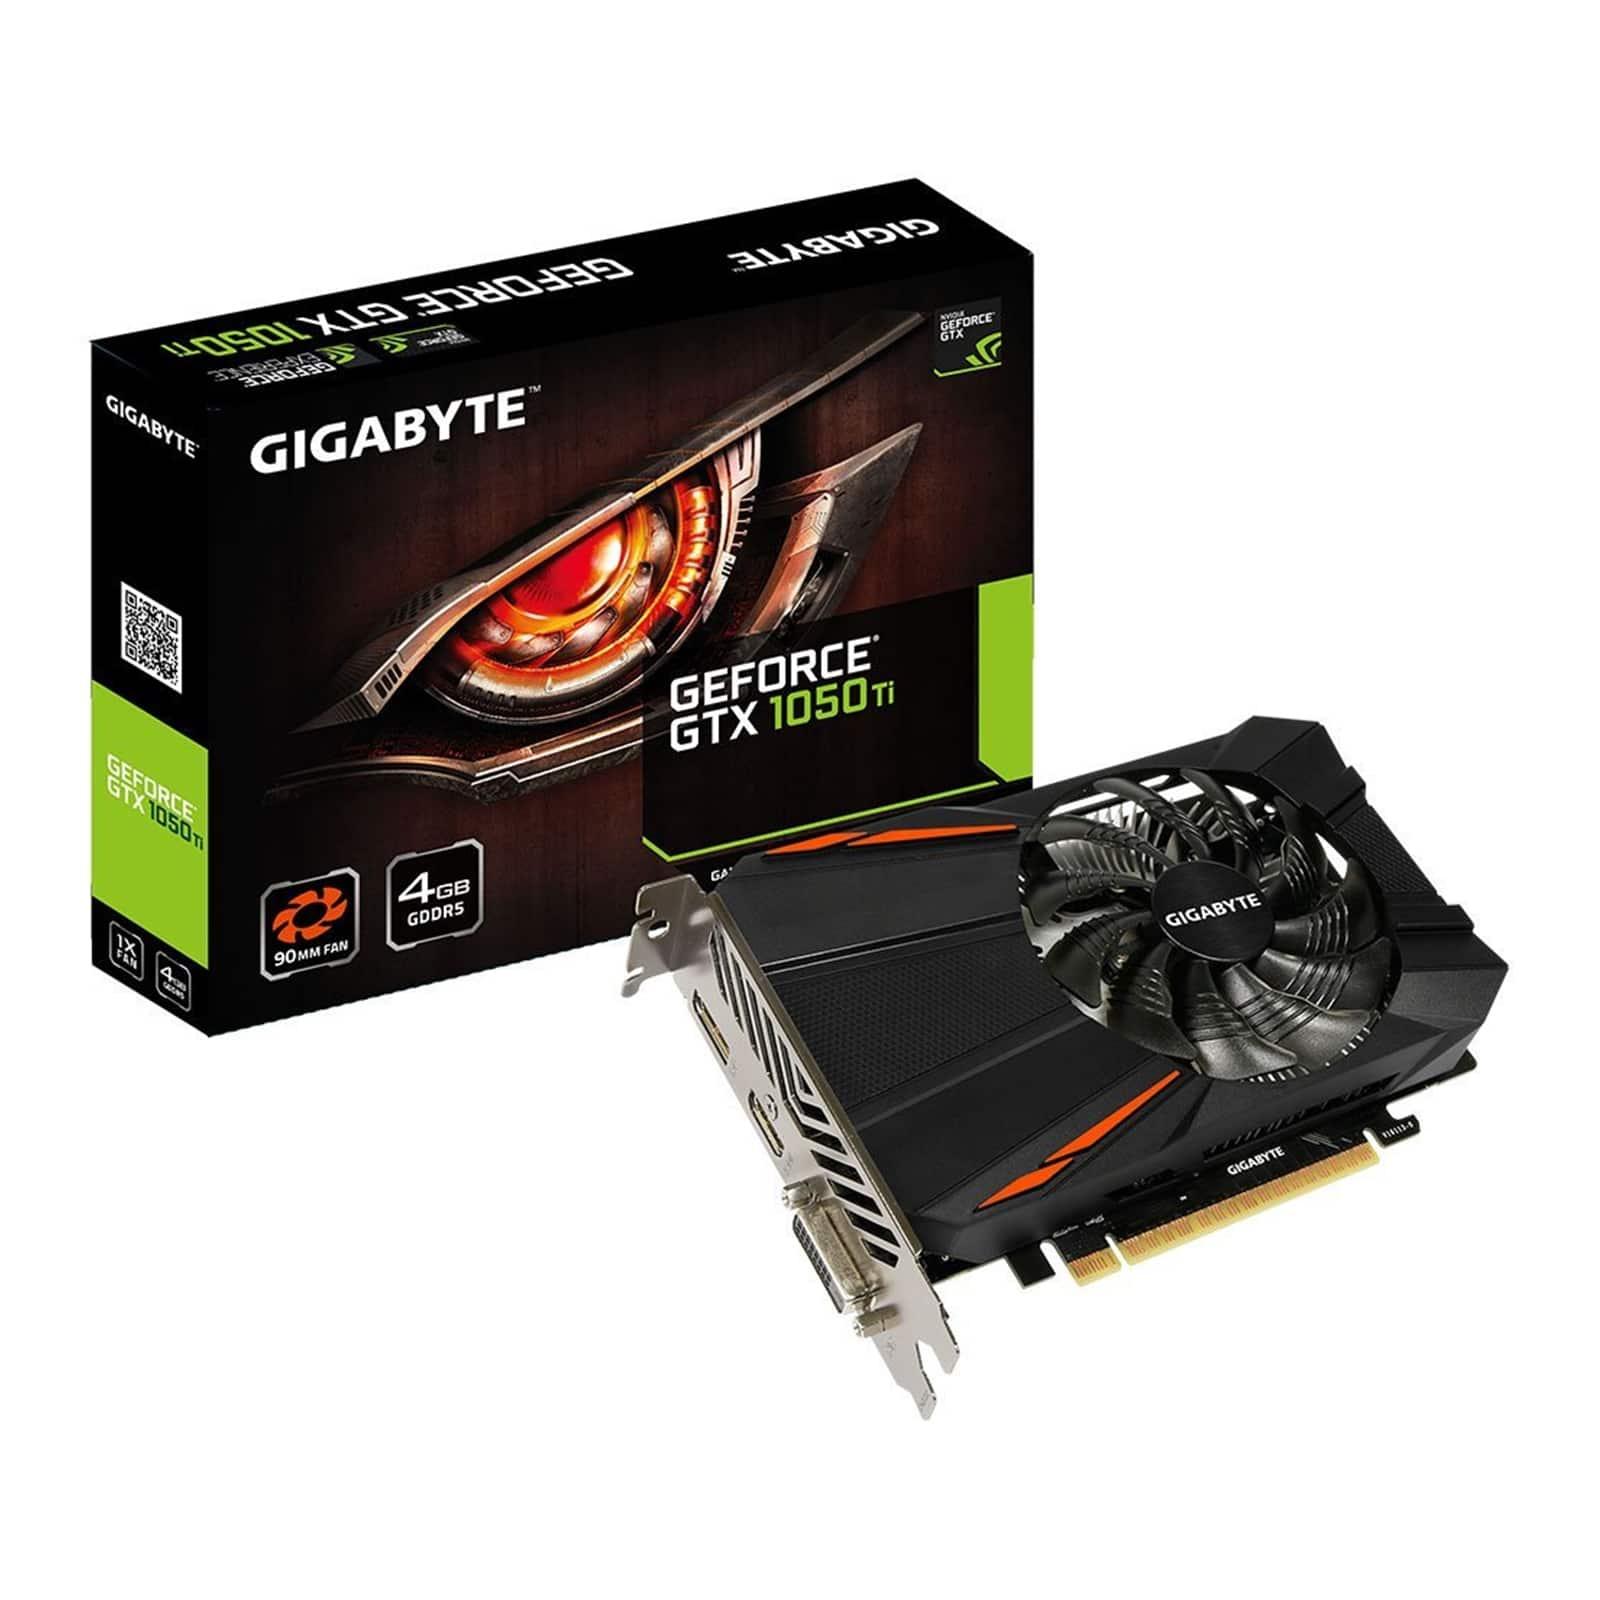 Gigabyte GTX 1050 Ti 4GB D5 Box View